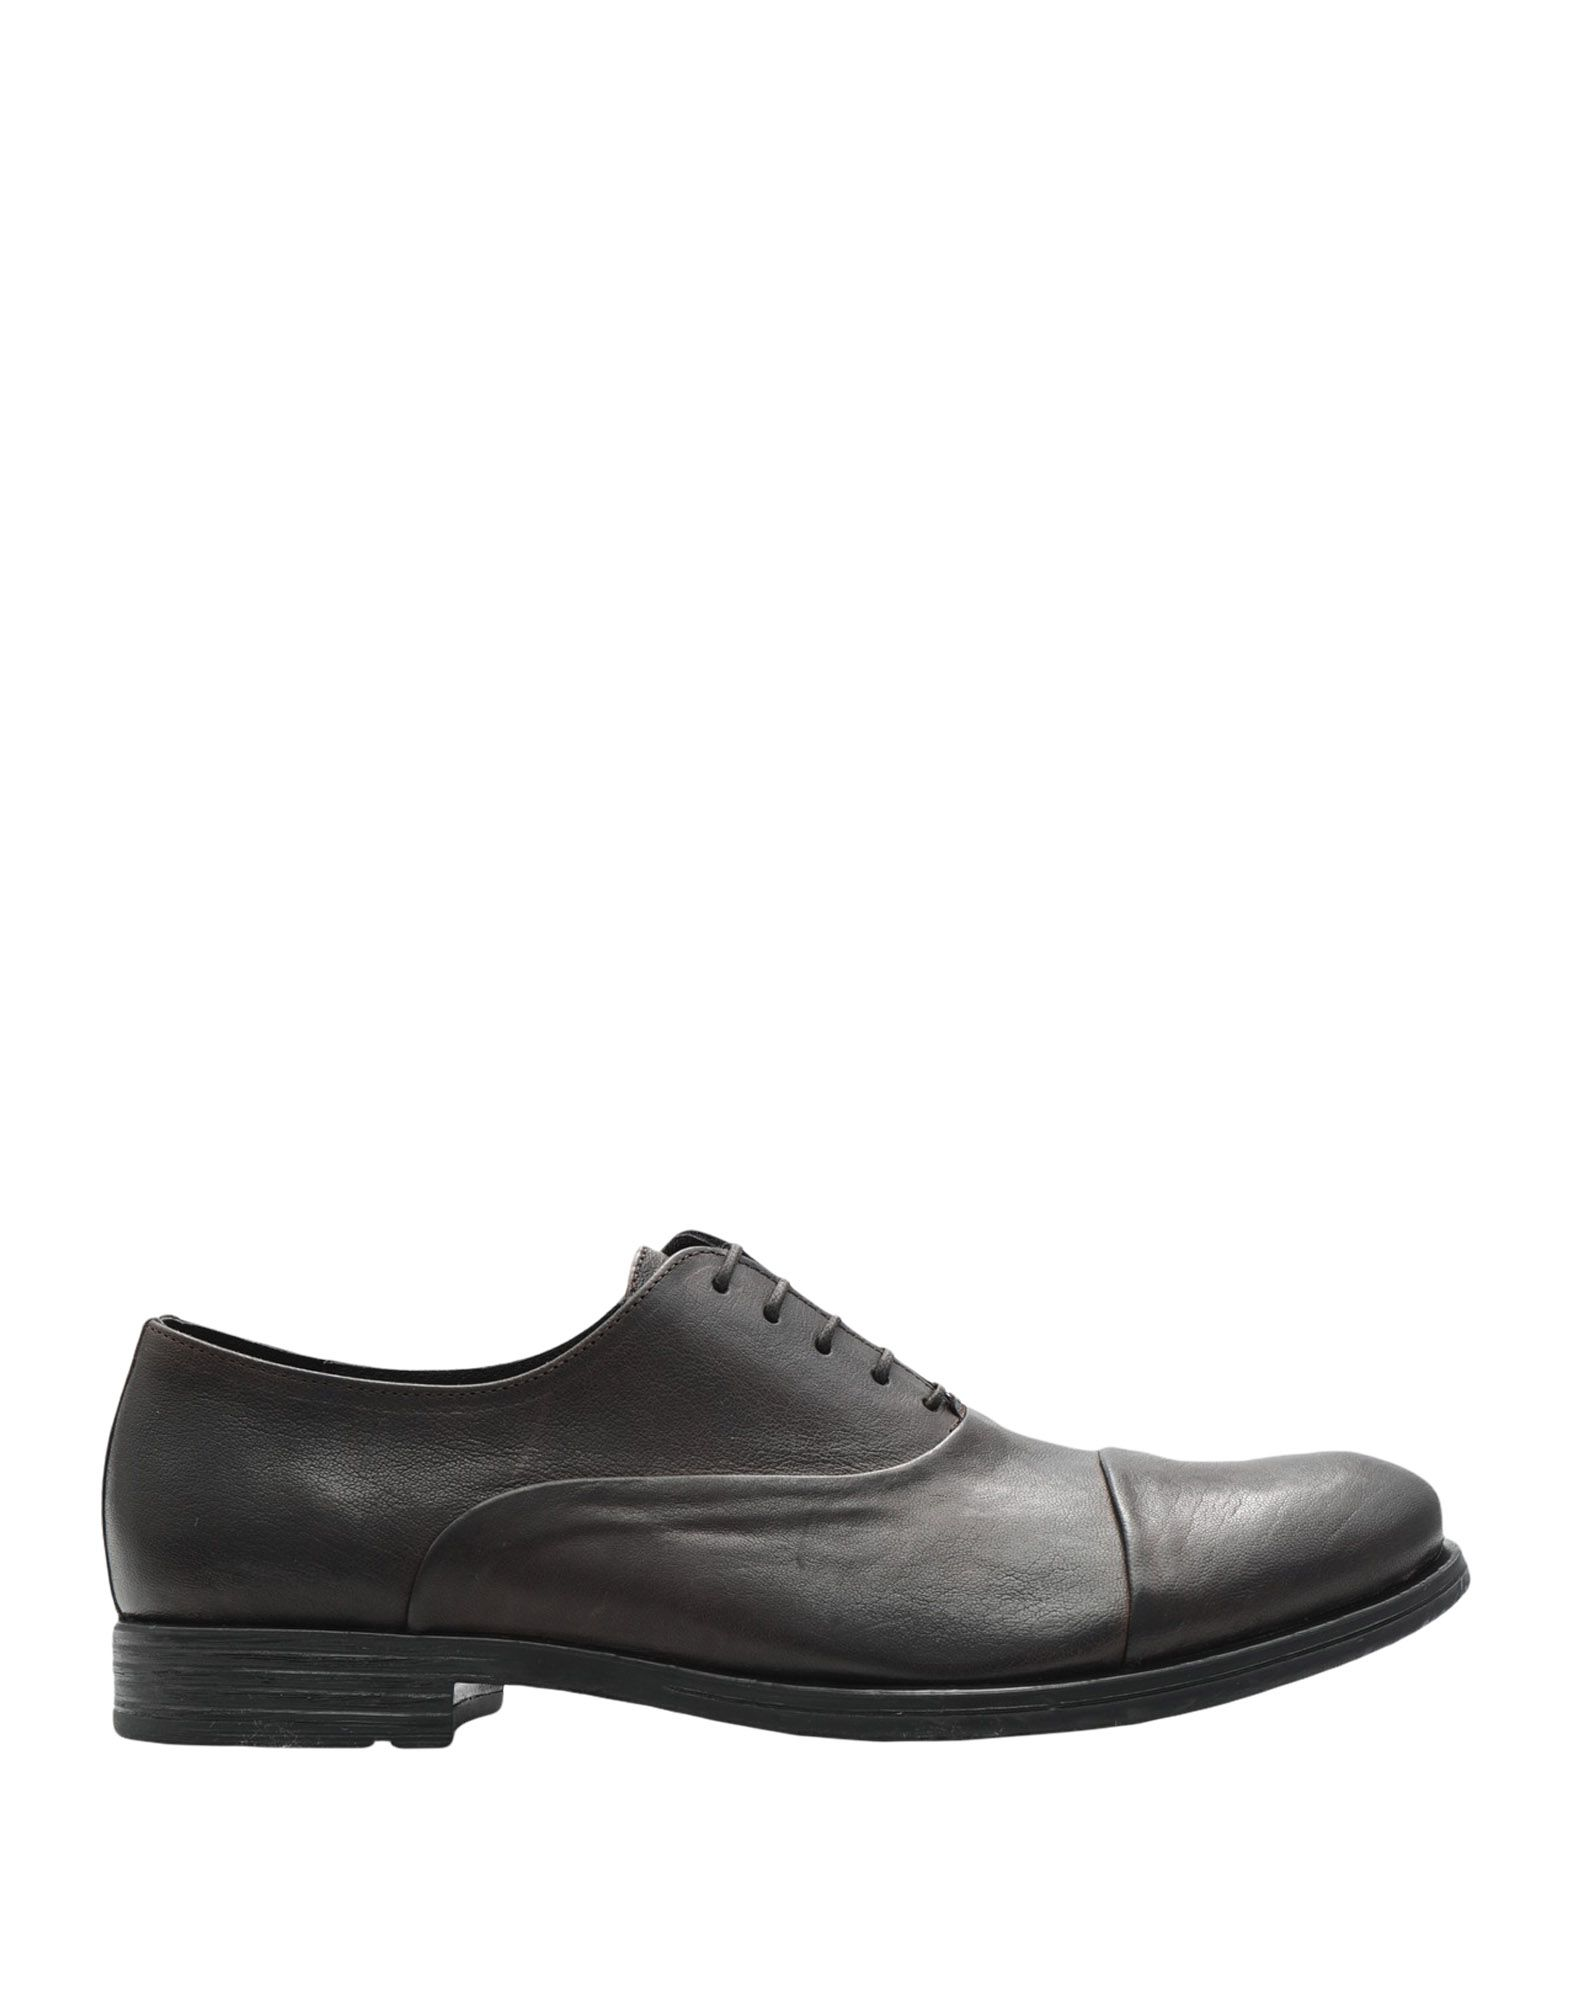 Фото - PAWELK'S Обувь на шнурках обувь на высокой платформе dkny